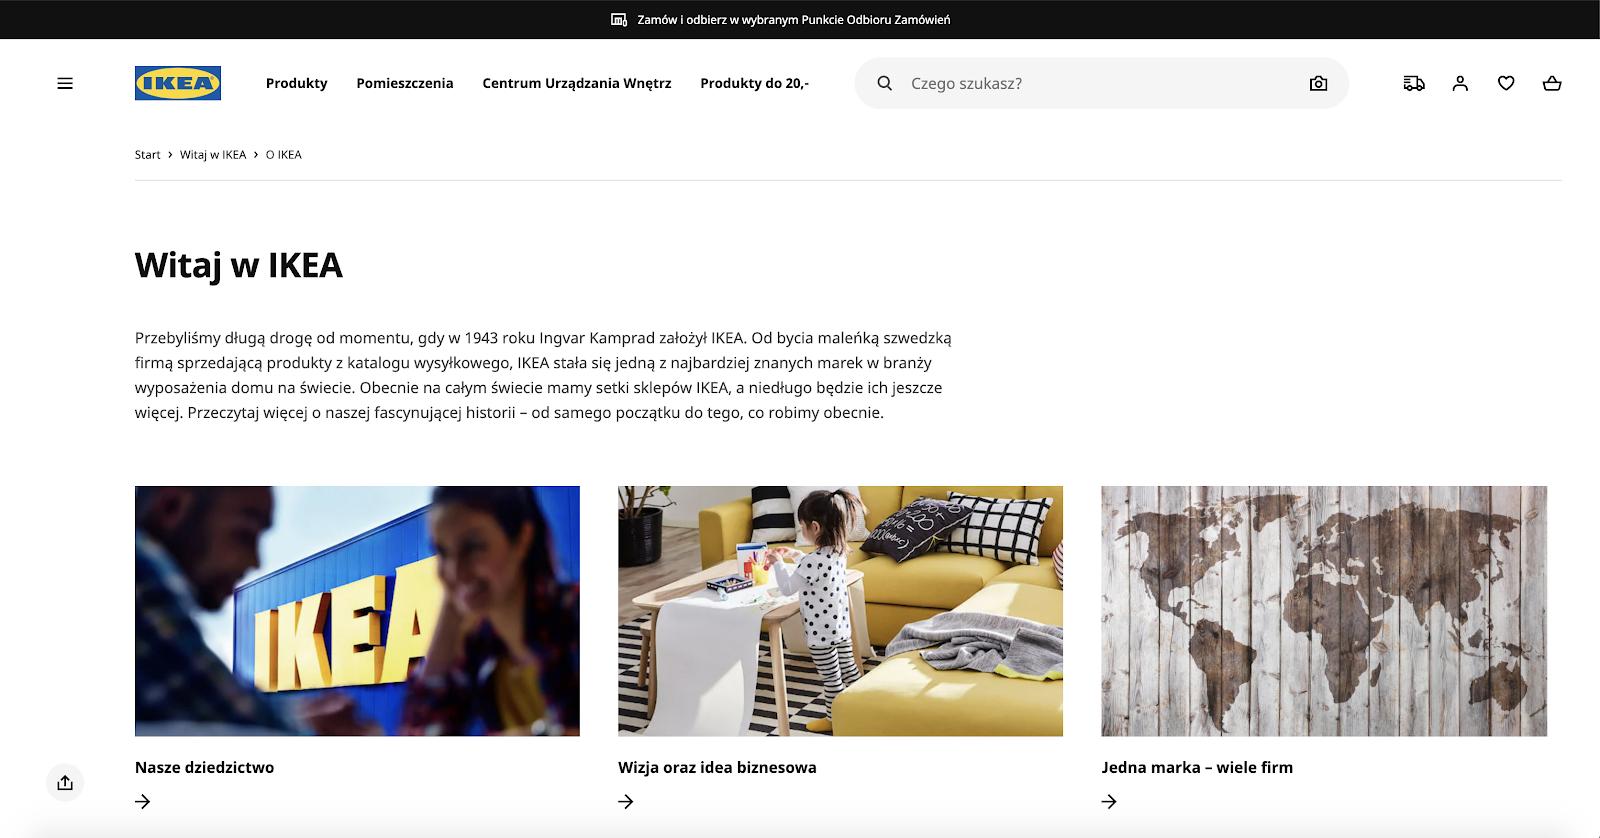 IKEA Polish site